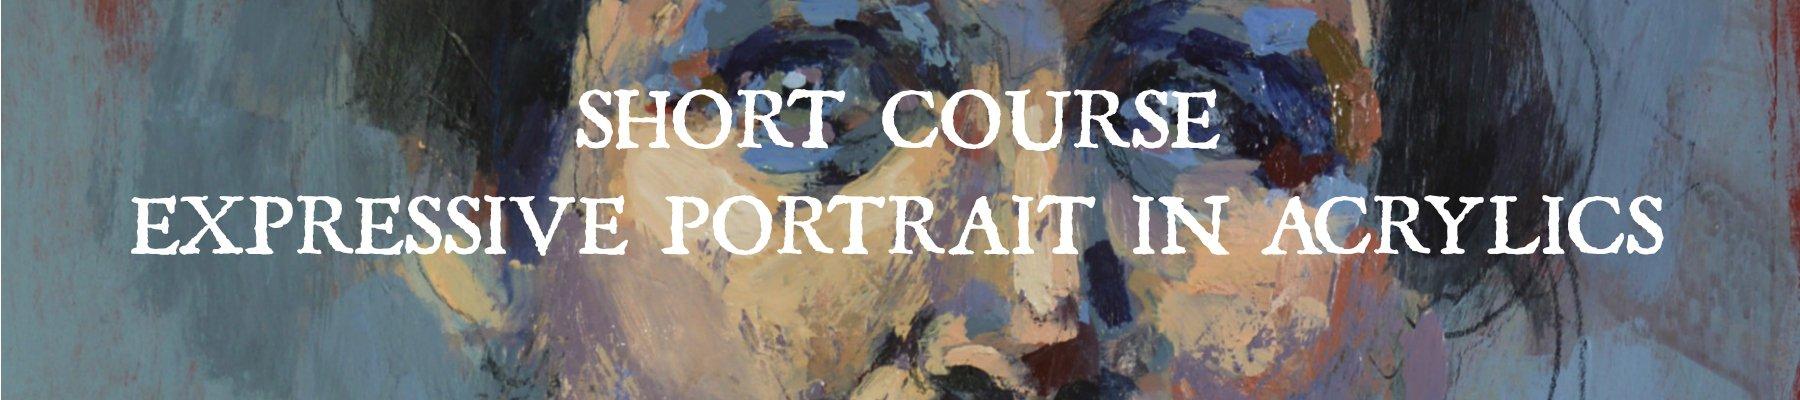 Short Course Expressive Portrait in Acrylics banner